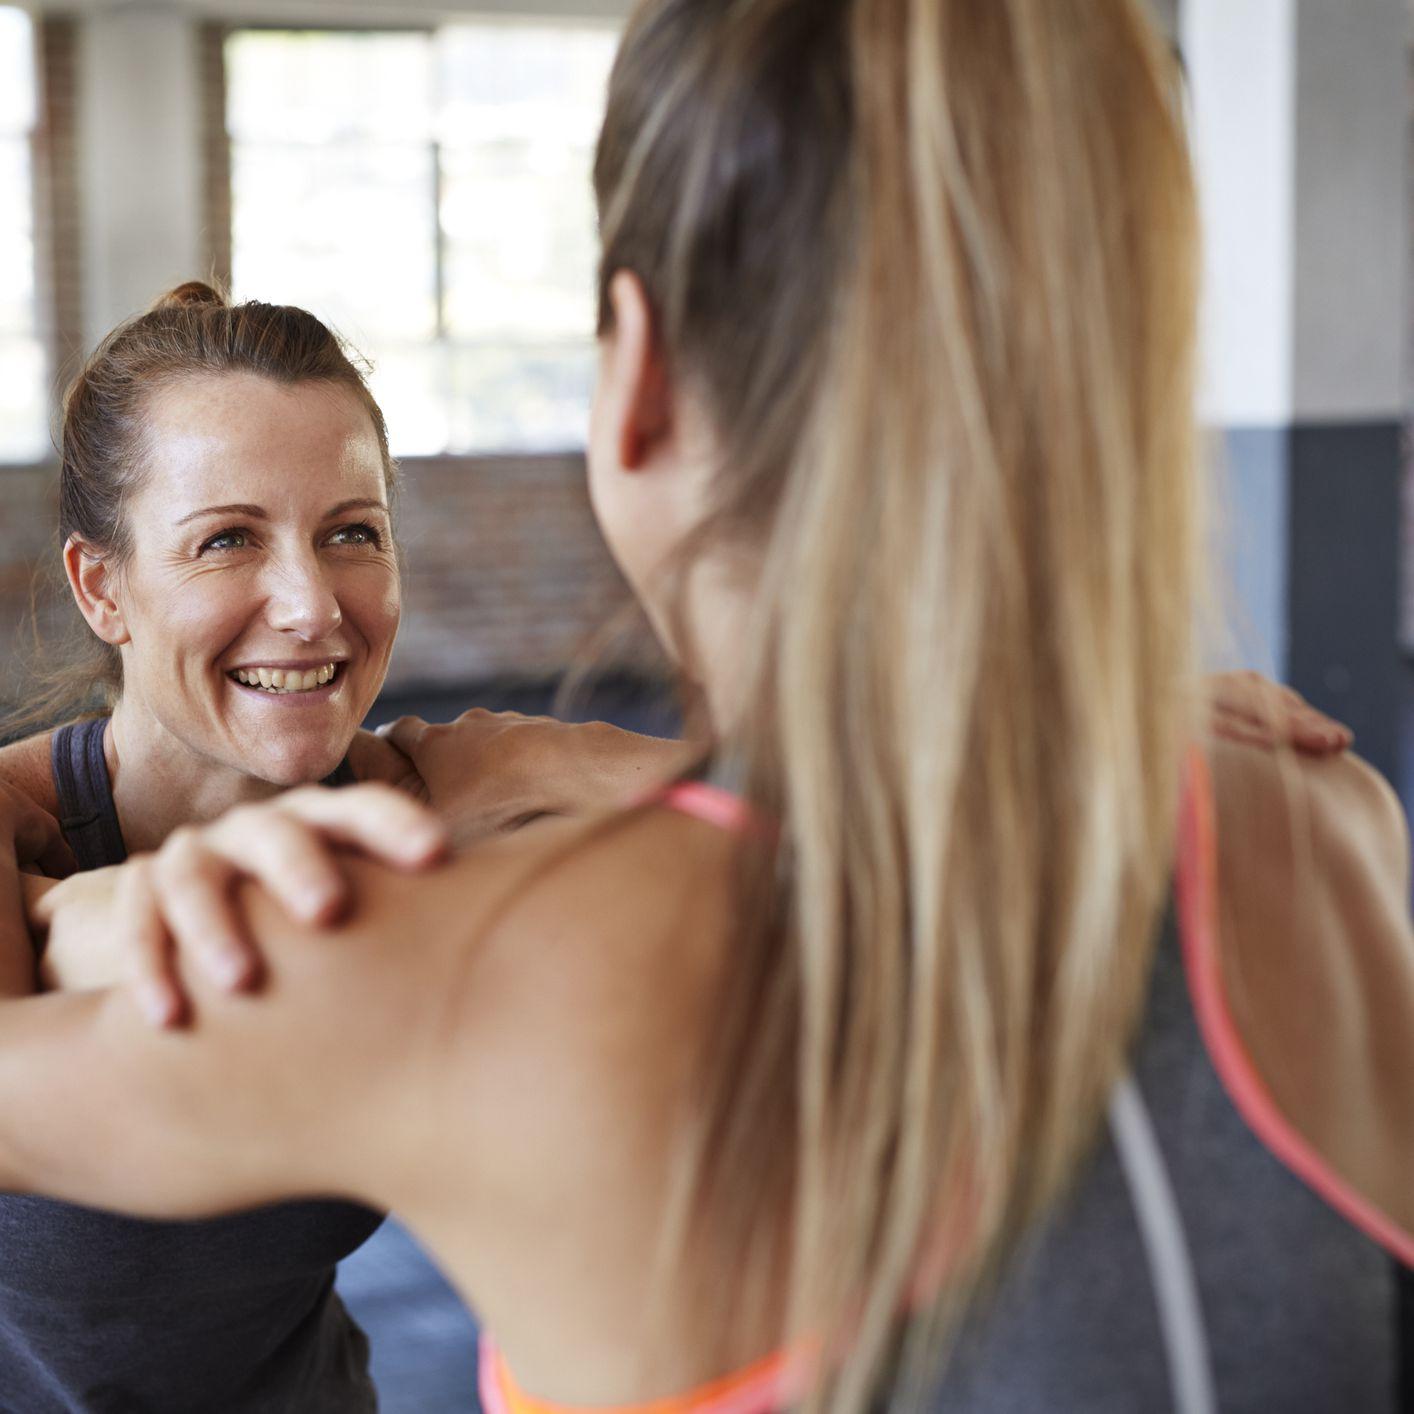 Personal trainer dating website dating scene Minneapolis